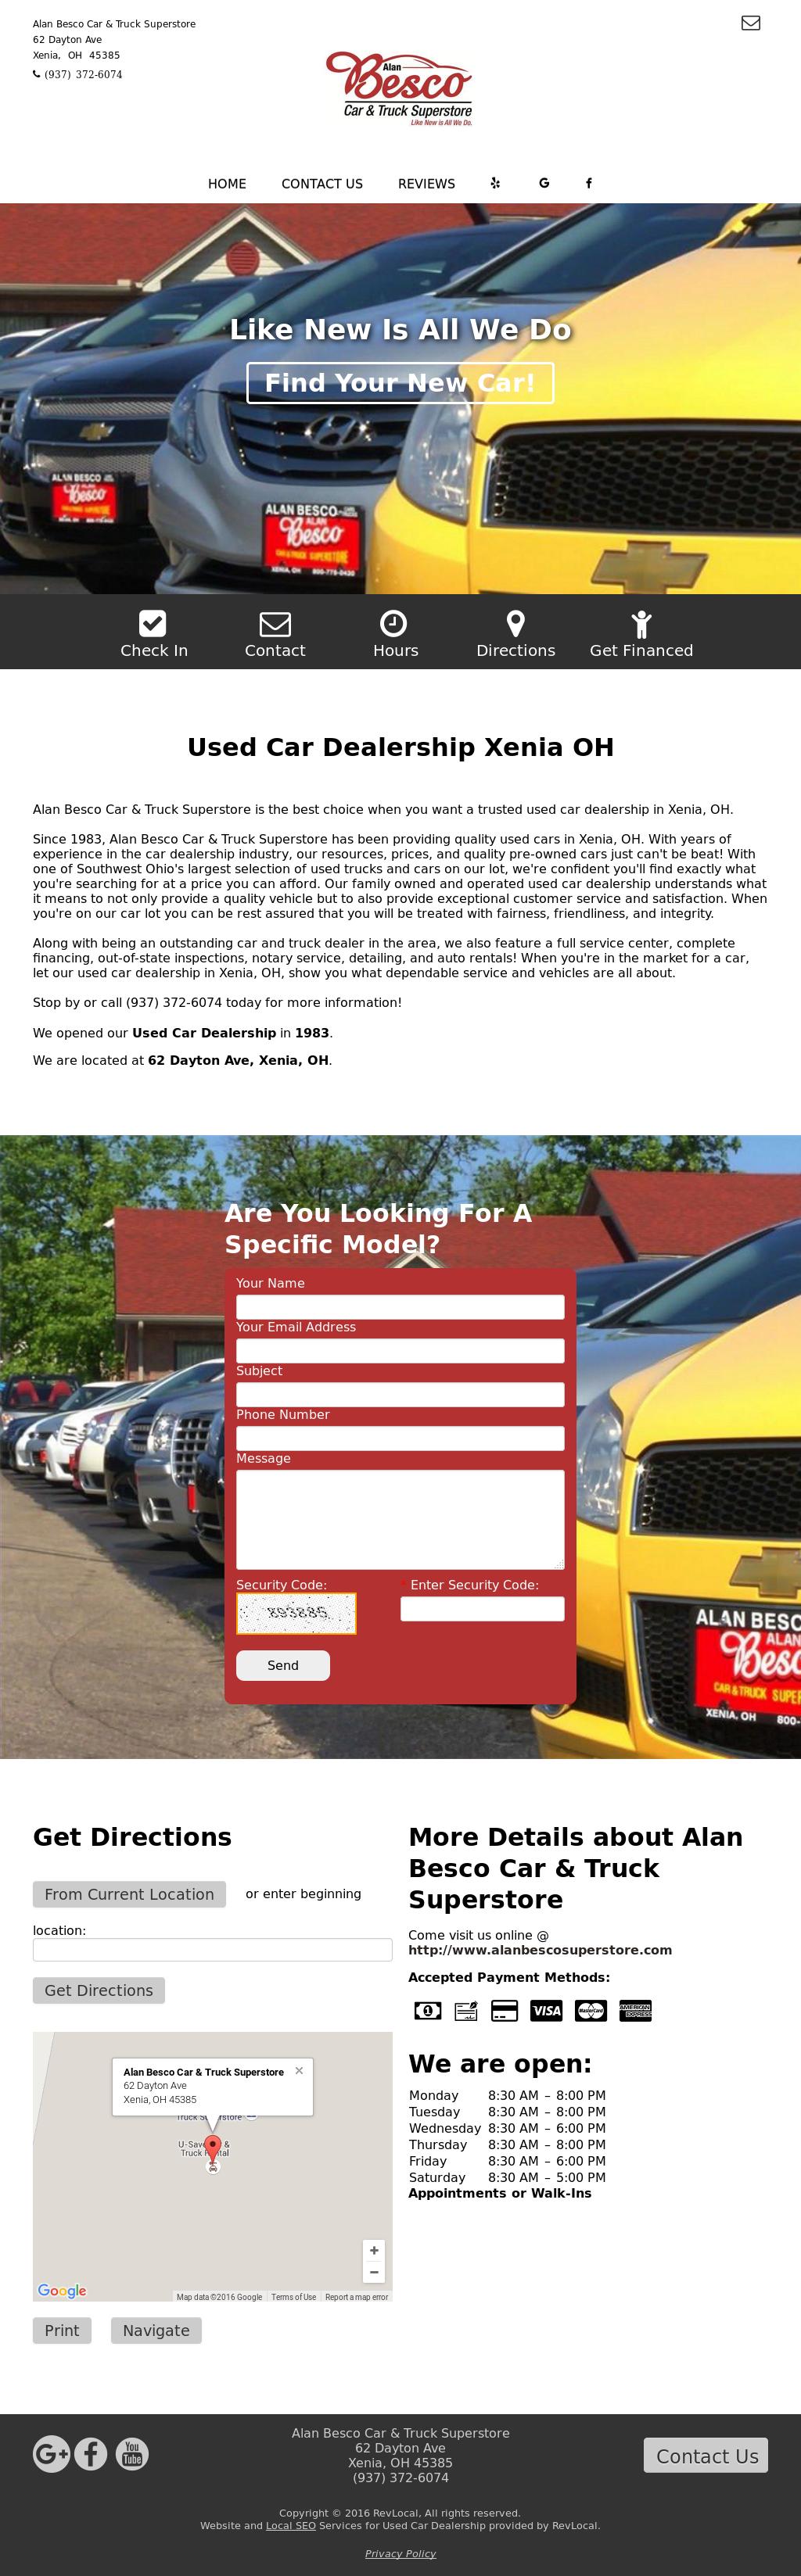 Alan Besco Car Truck Super Website History